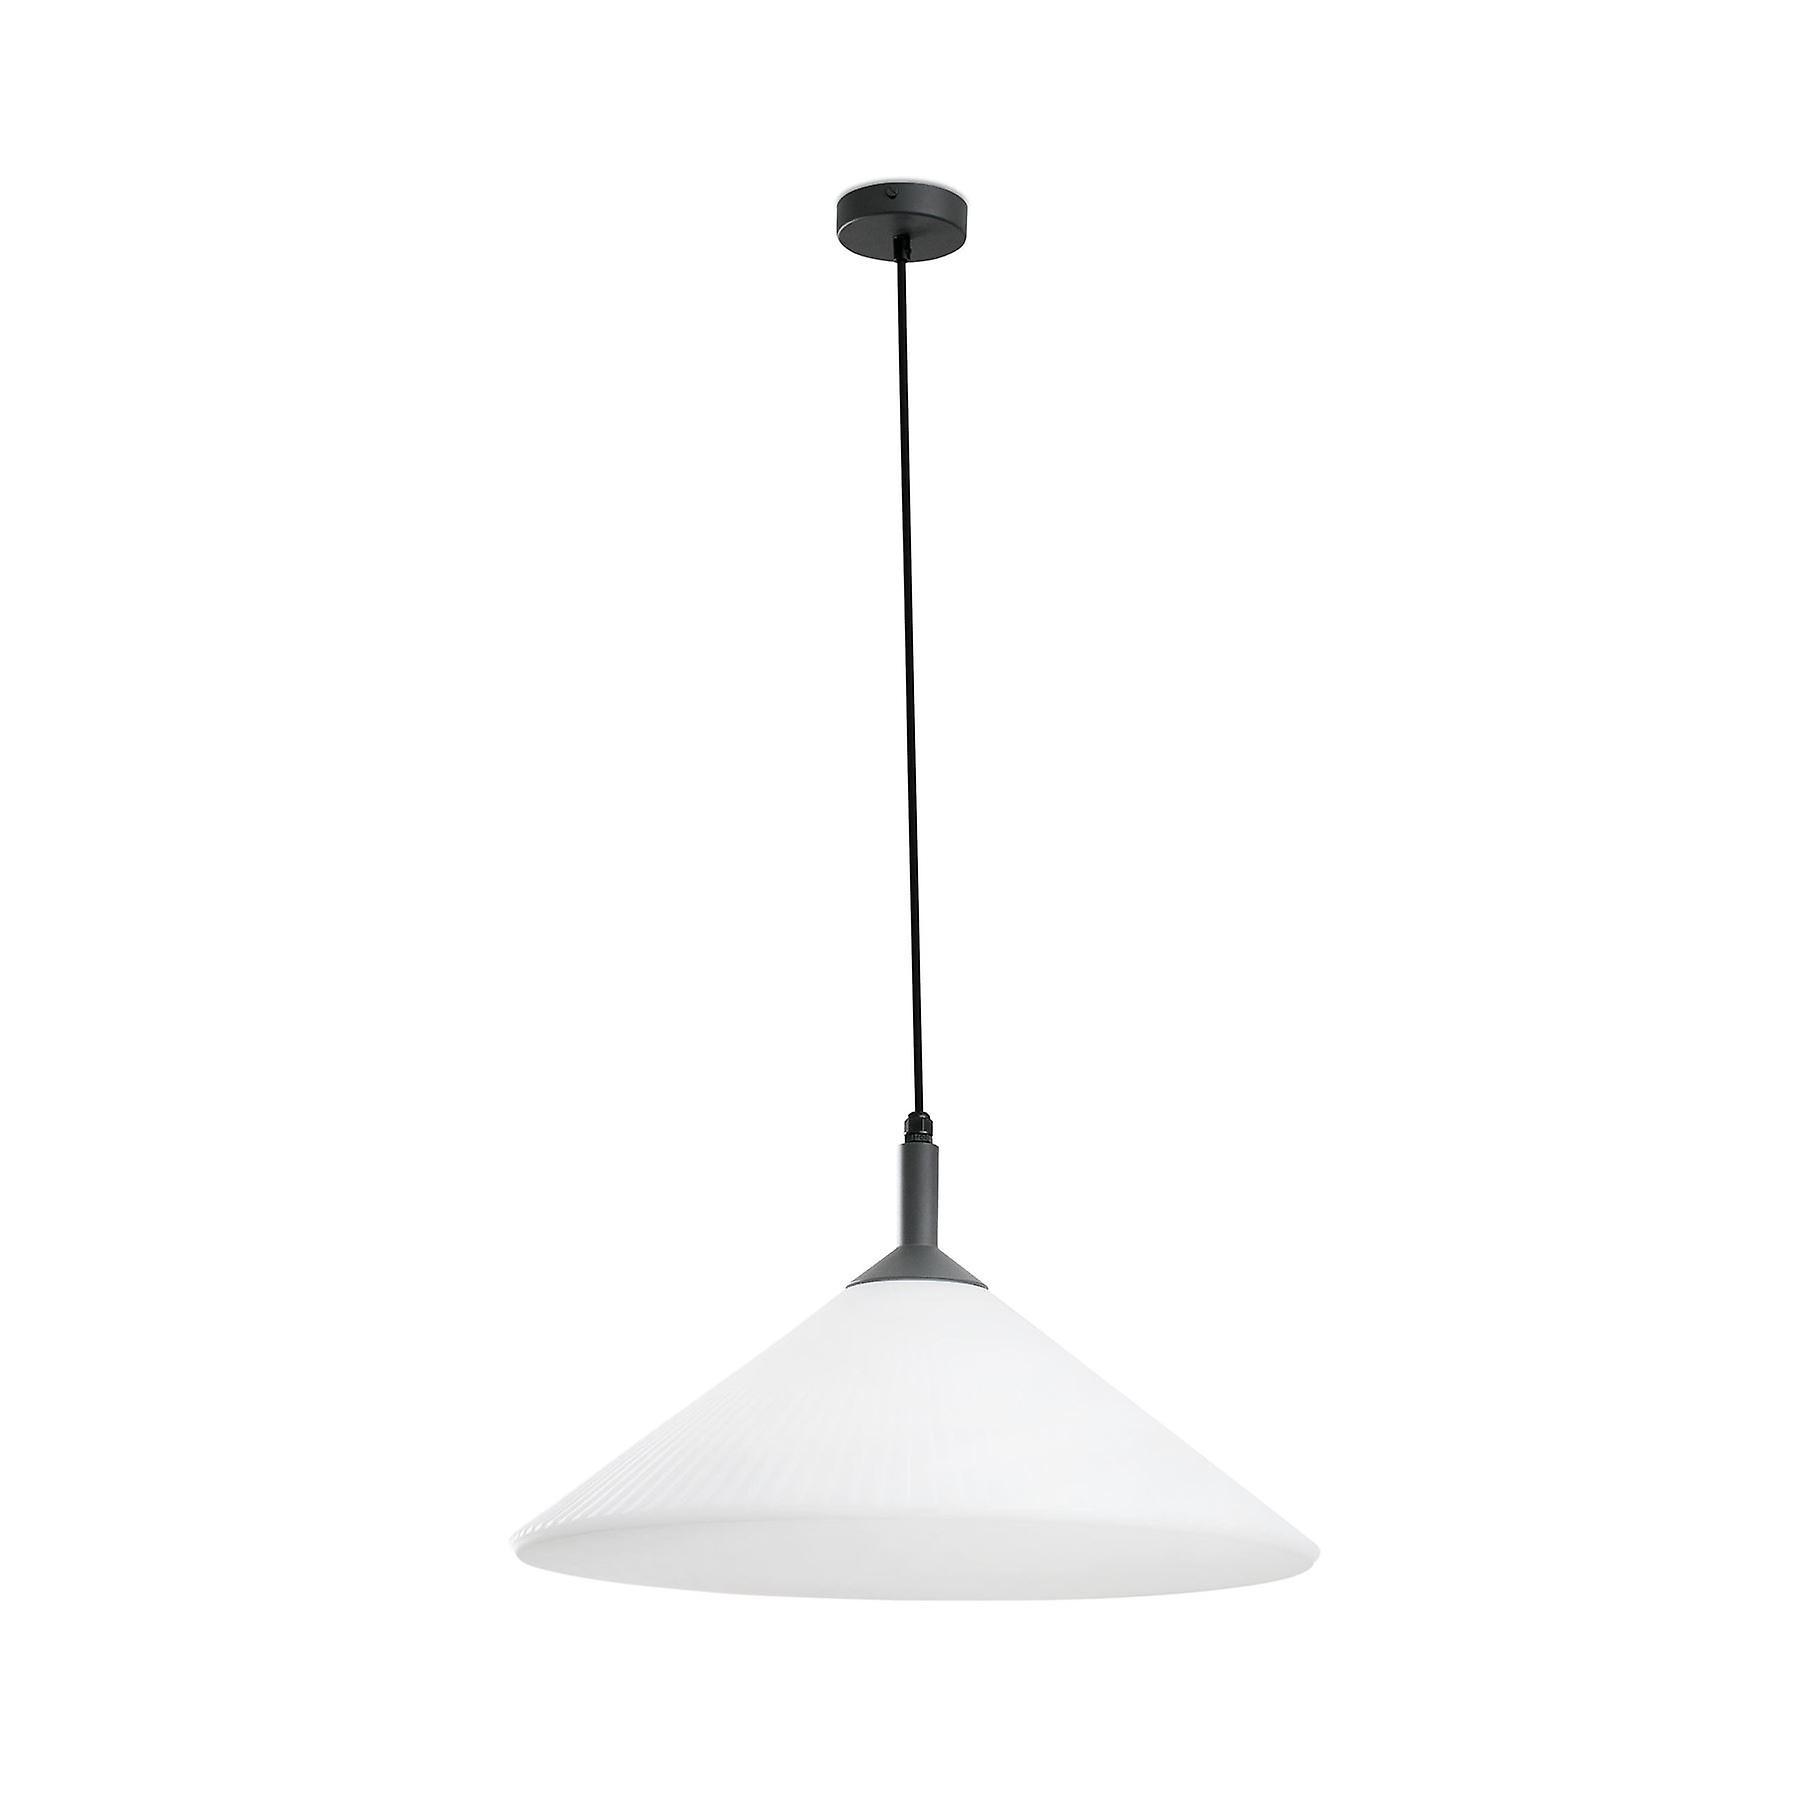 Faro - Hue gris And blanc de plein air pendentif FARO71568